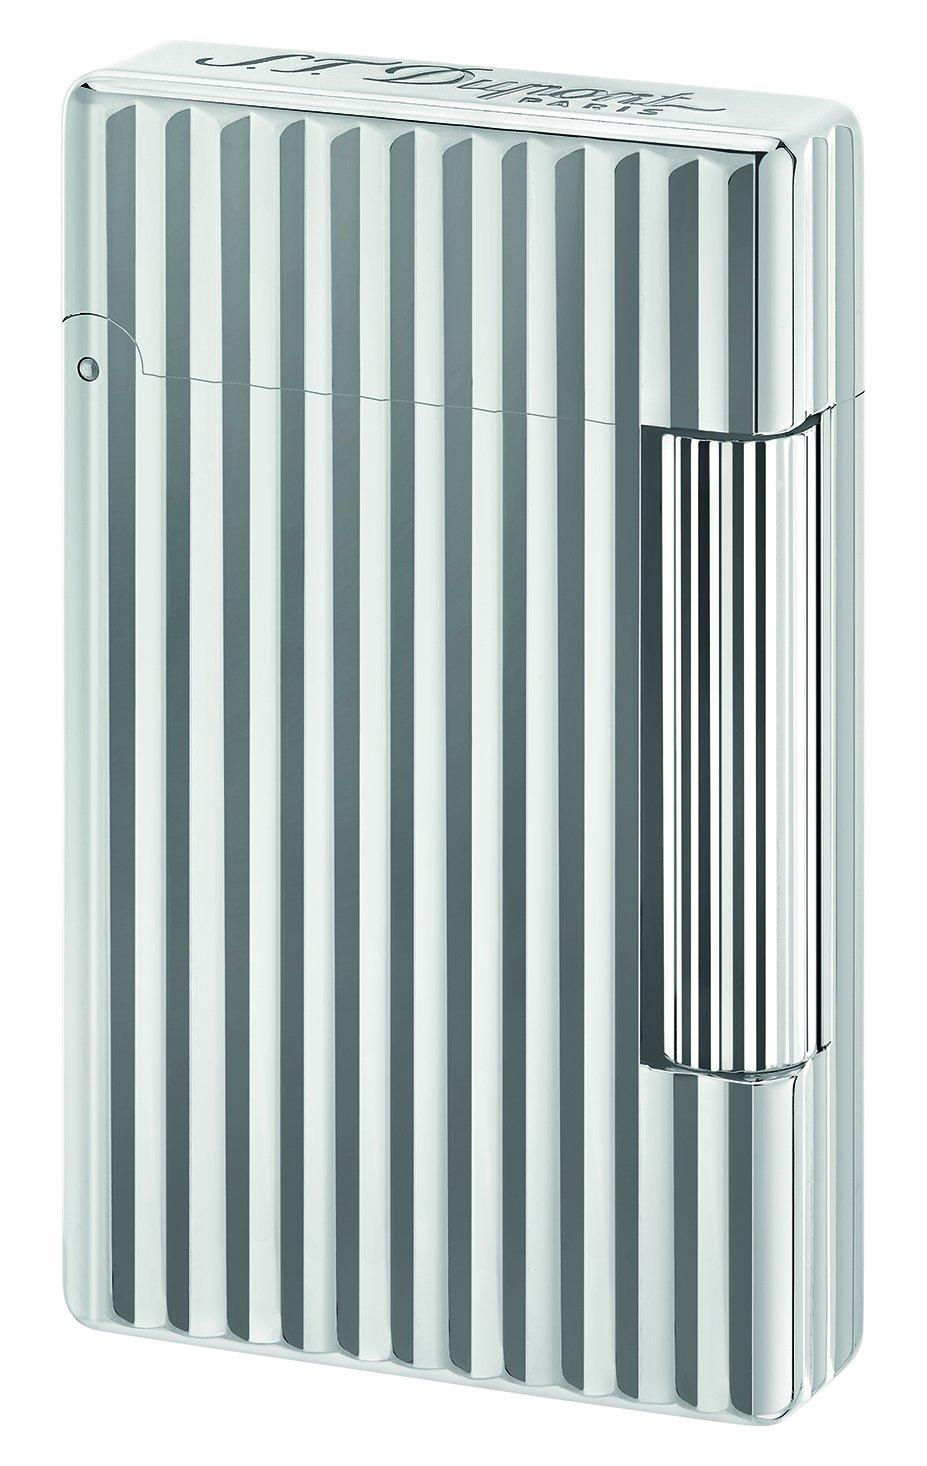 S.T. Dupont ''Initial'' Line White Bronze Finish Flint Lighter 2017 / Grey 020802